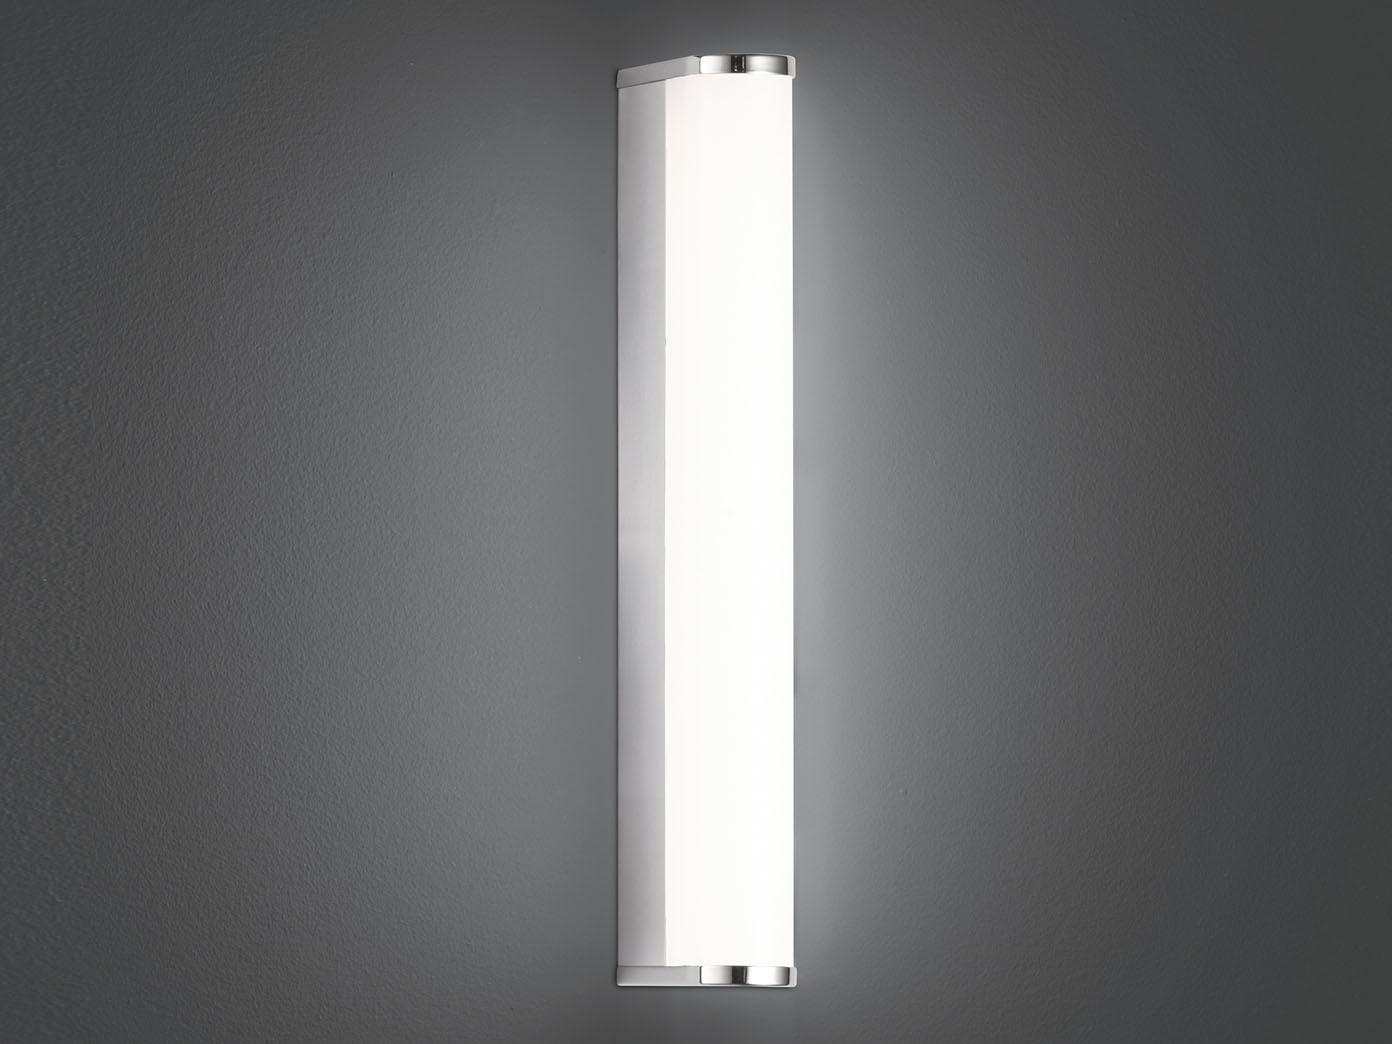 Klassische Honsel LED Badezimmer Wandlampe Spiegelleuchte 30 cm,  Badbeleuchtung